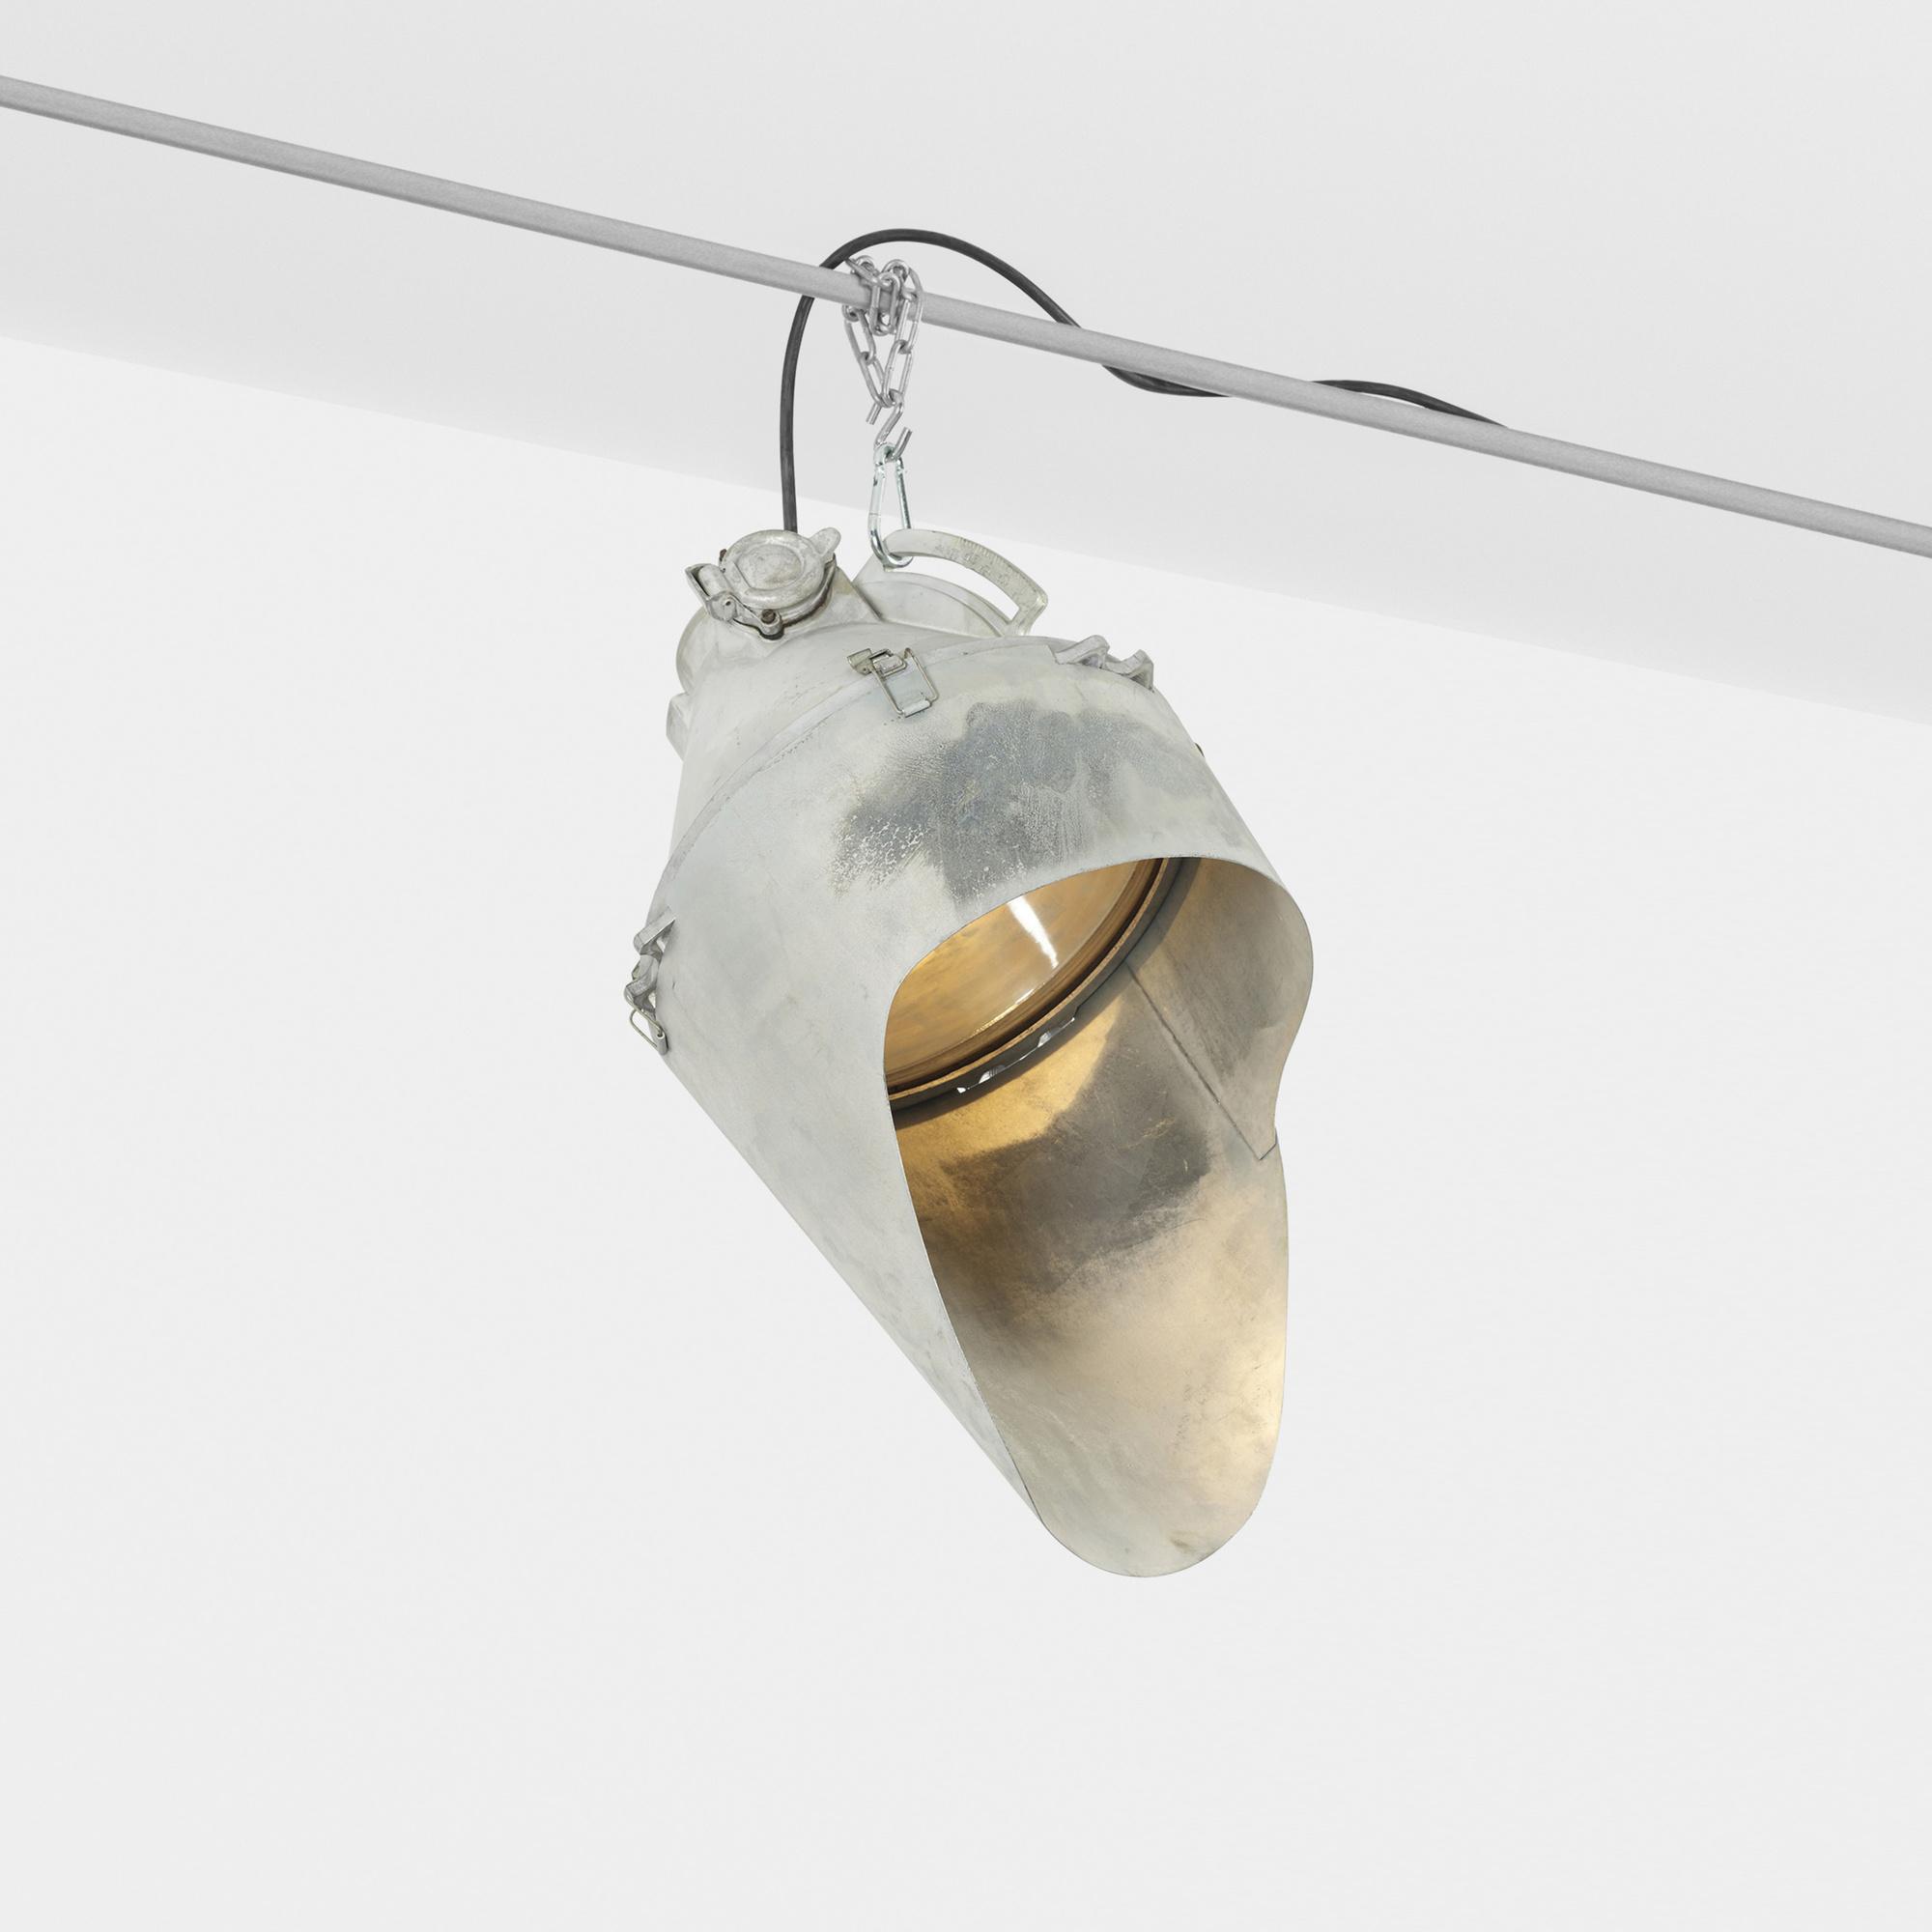 159: BBT (Barbier, Benard and Turenne) / industrial lamp (1 of 1)